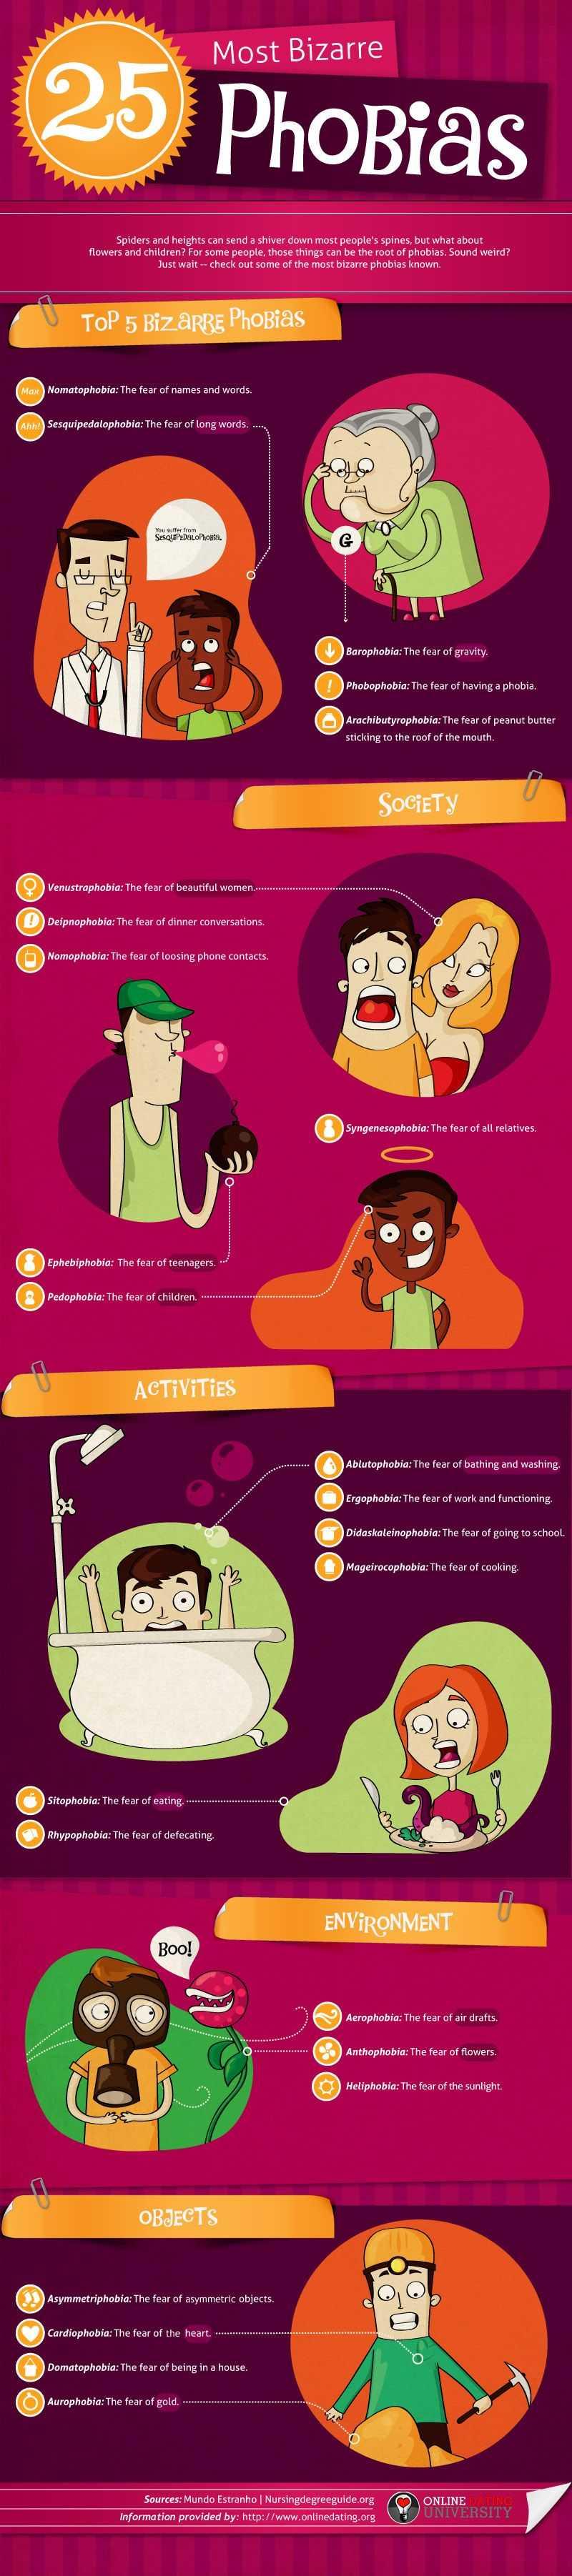 25 Most Bizarre Phobias